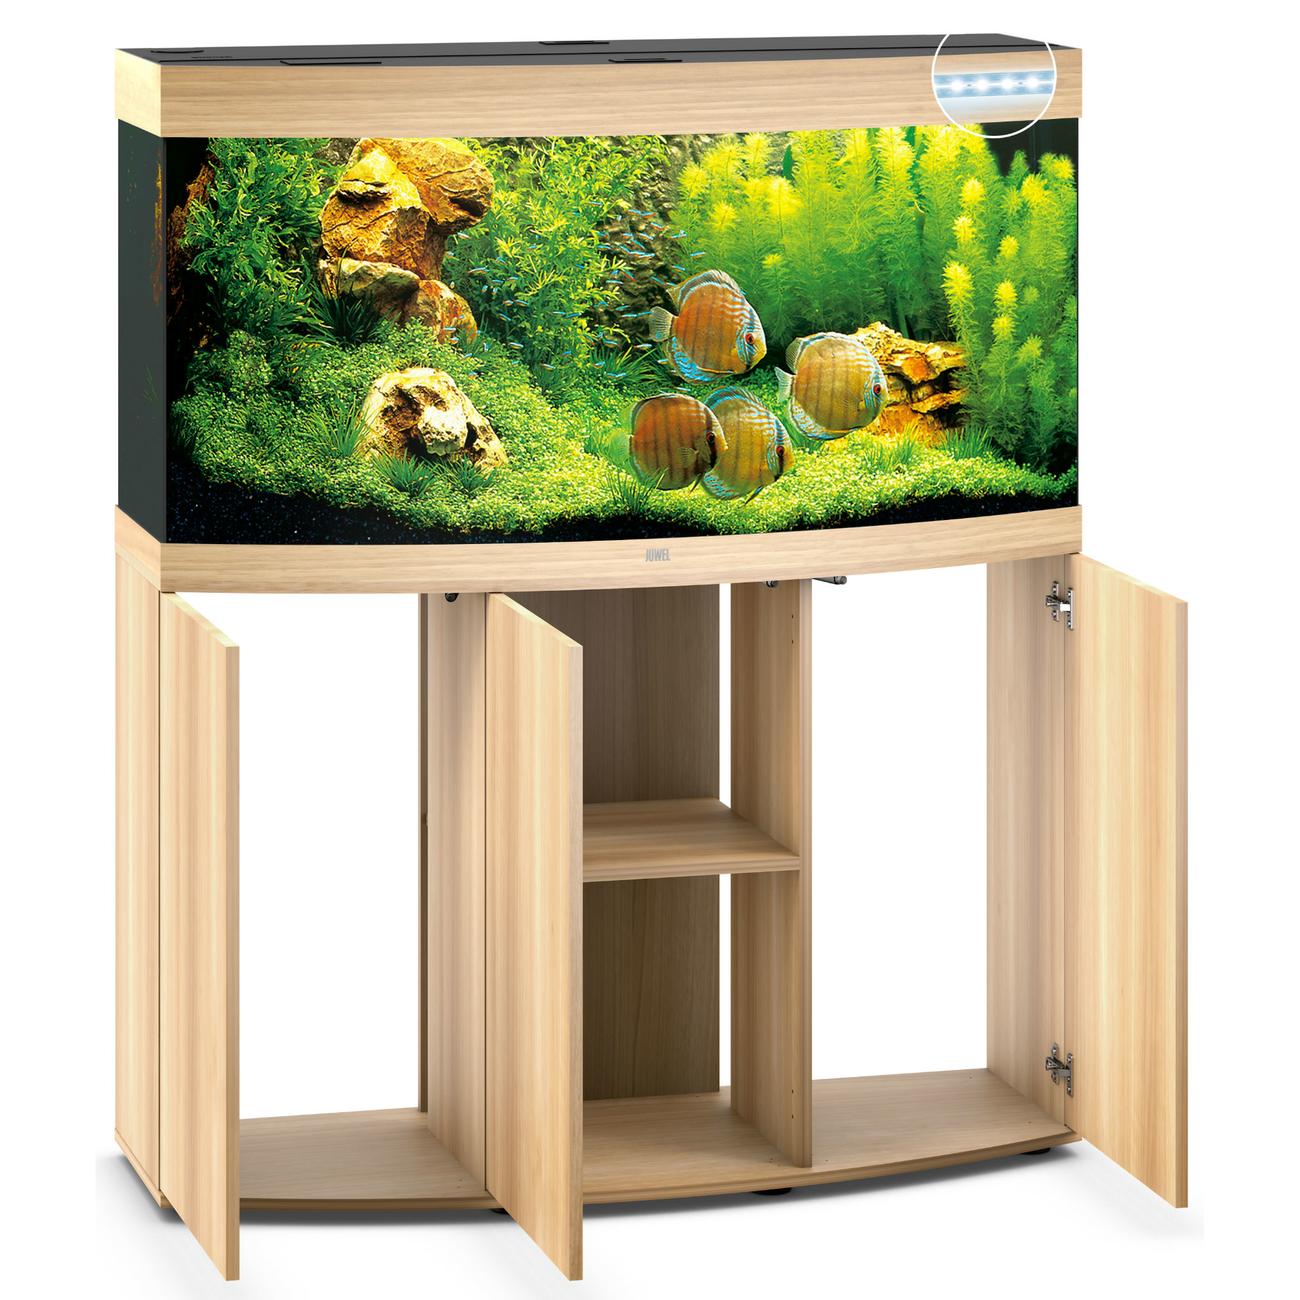 Juwel Vision 260 LED Aquarium mit Unterschrank SBX, Bild 18